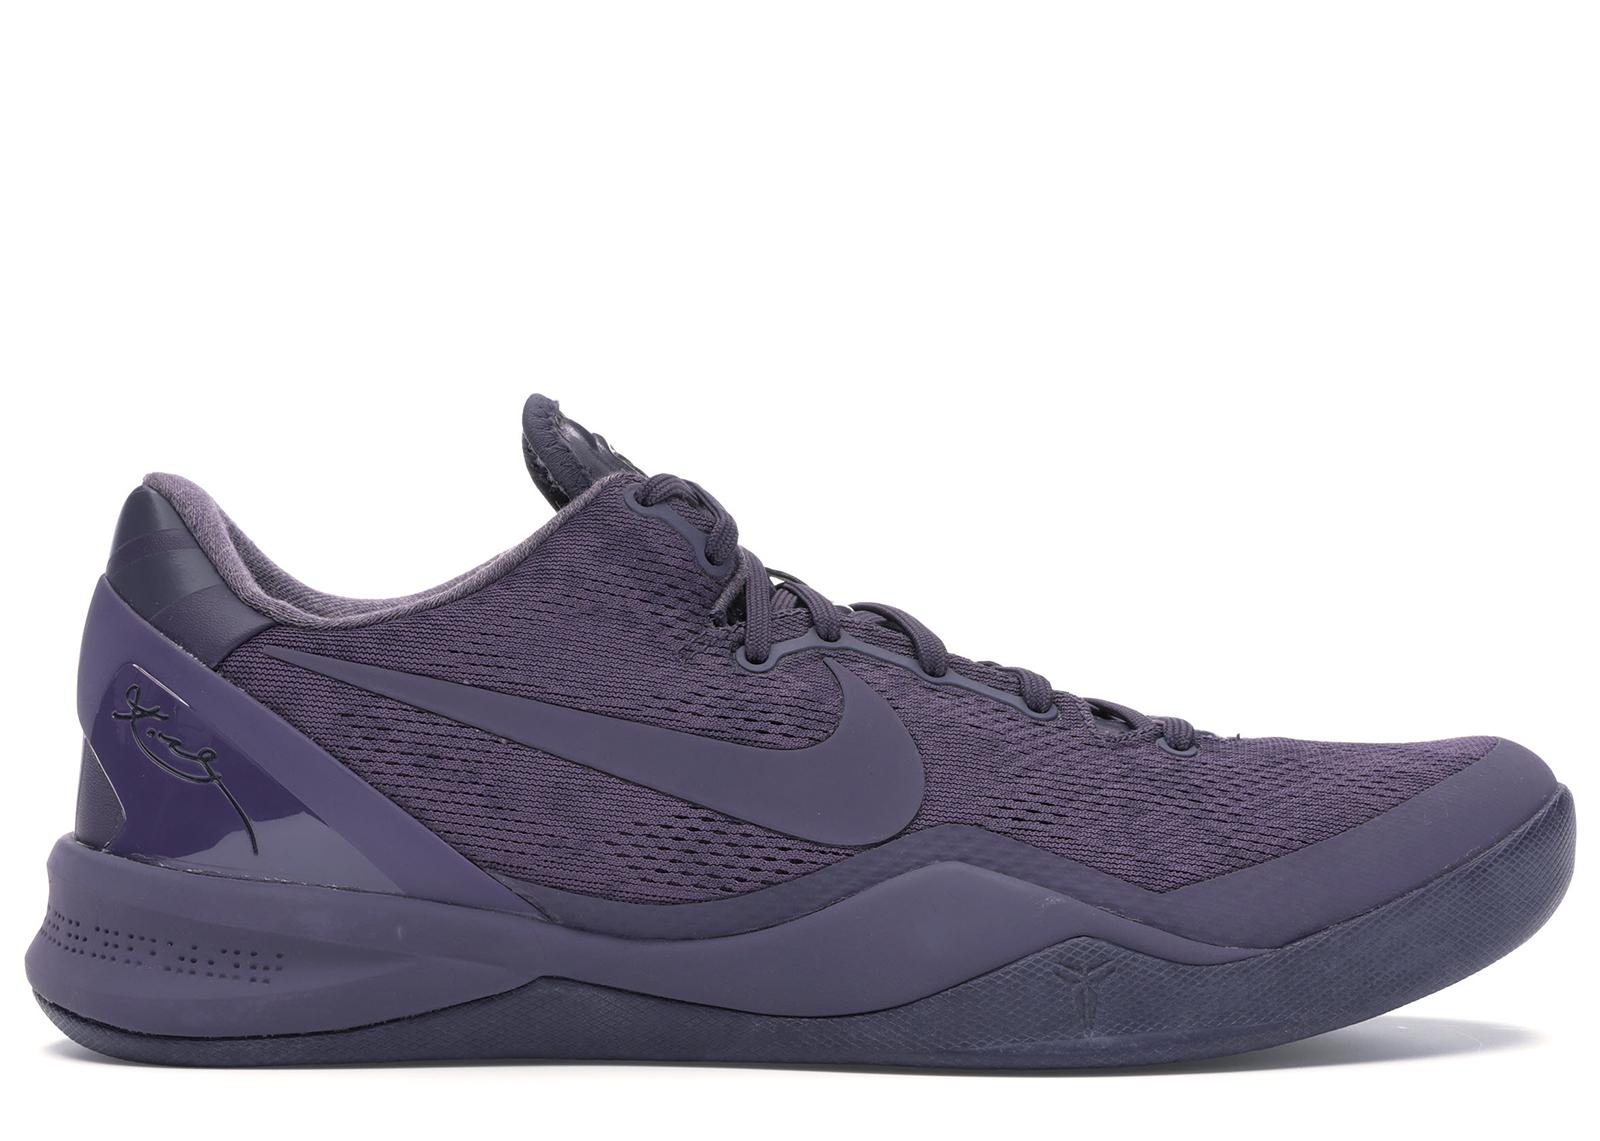 Nike Kobe 8 Black Mamba Collection Fade